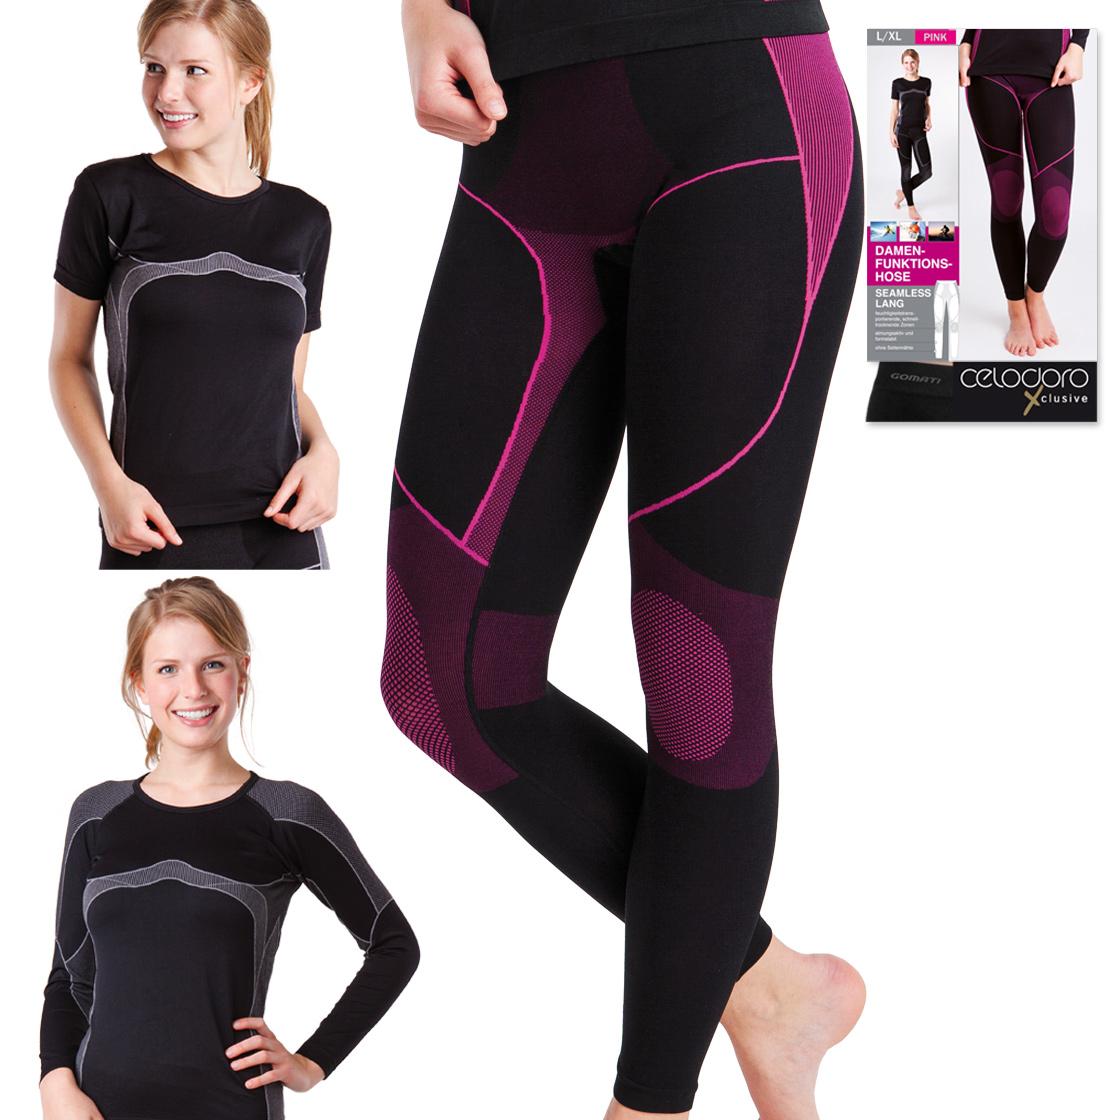 bf0177e9fb8c40 Details zu Damen Seamless Thermo Funktionswäsche Hose Ski Unterhose Pink /  Grau S M L XL